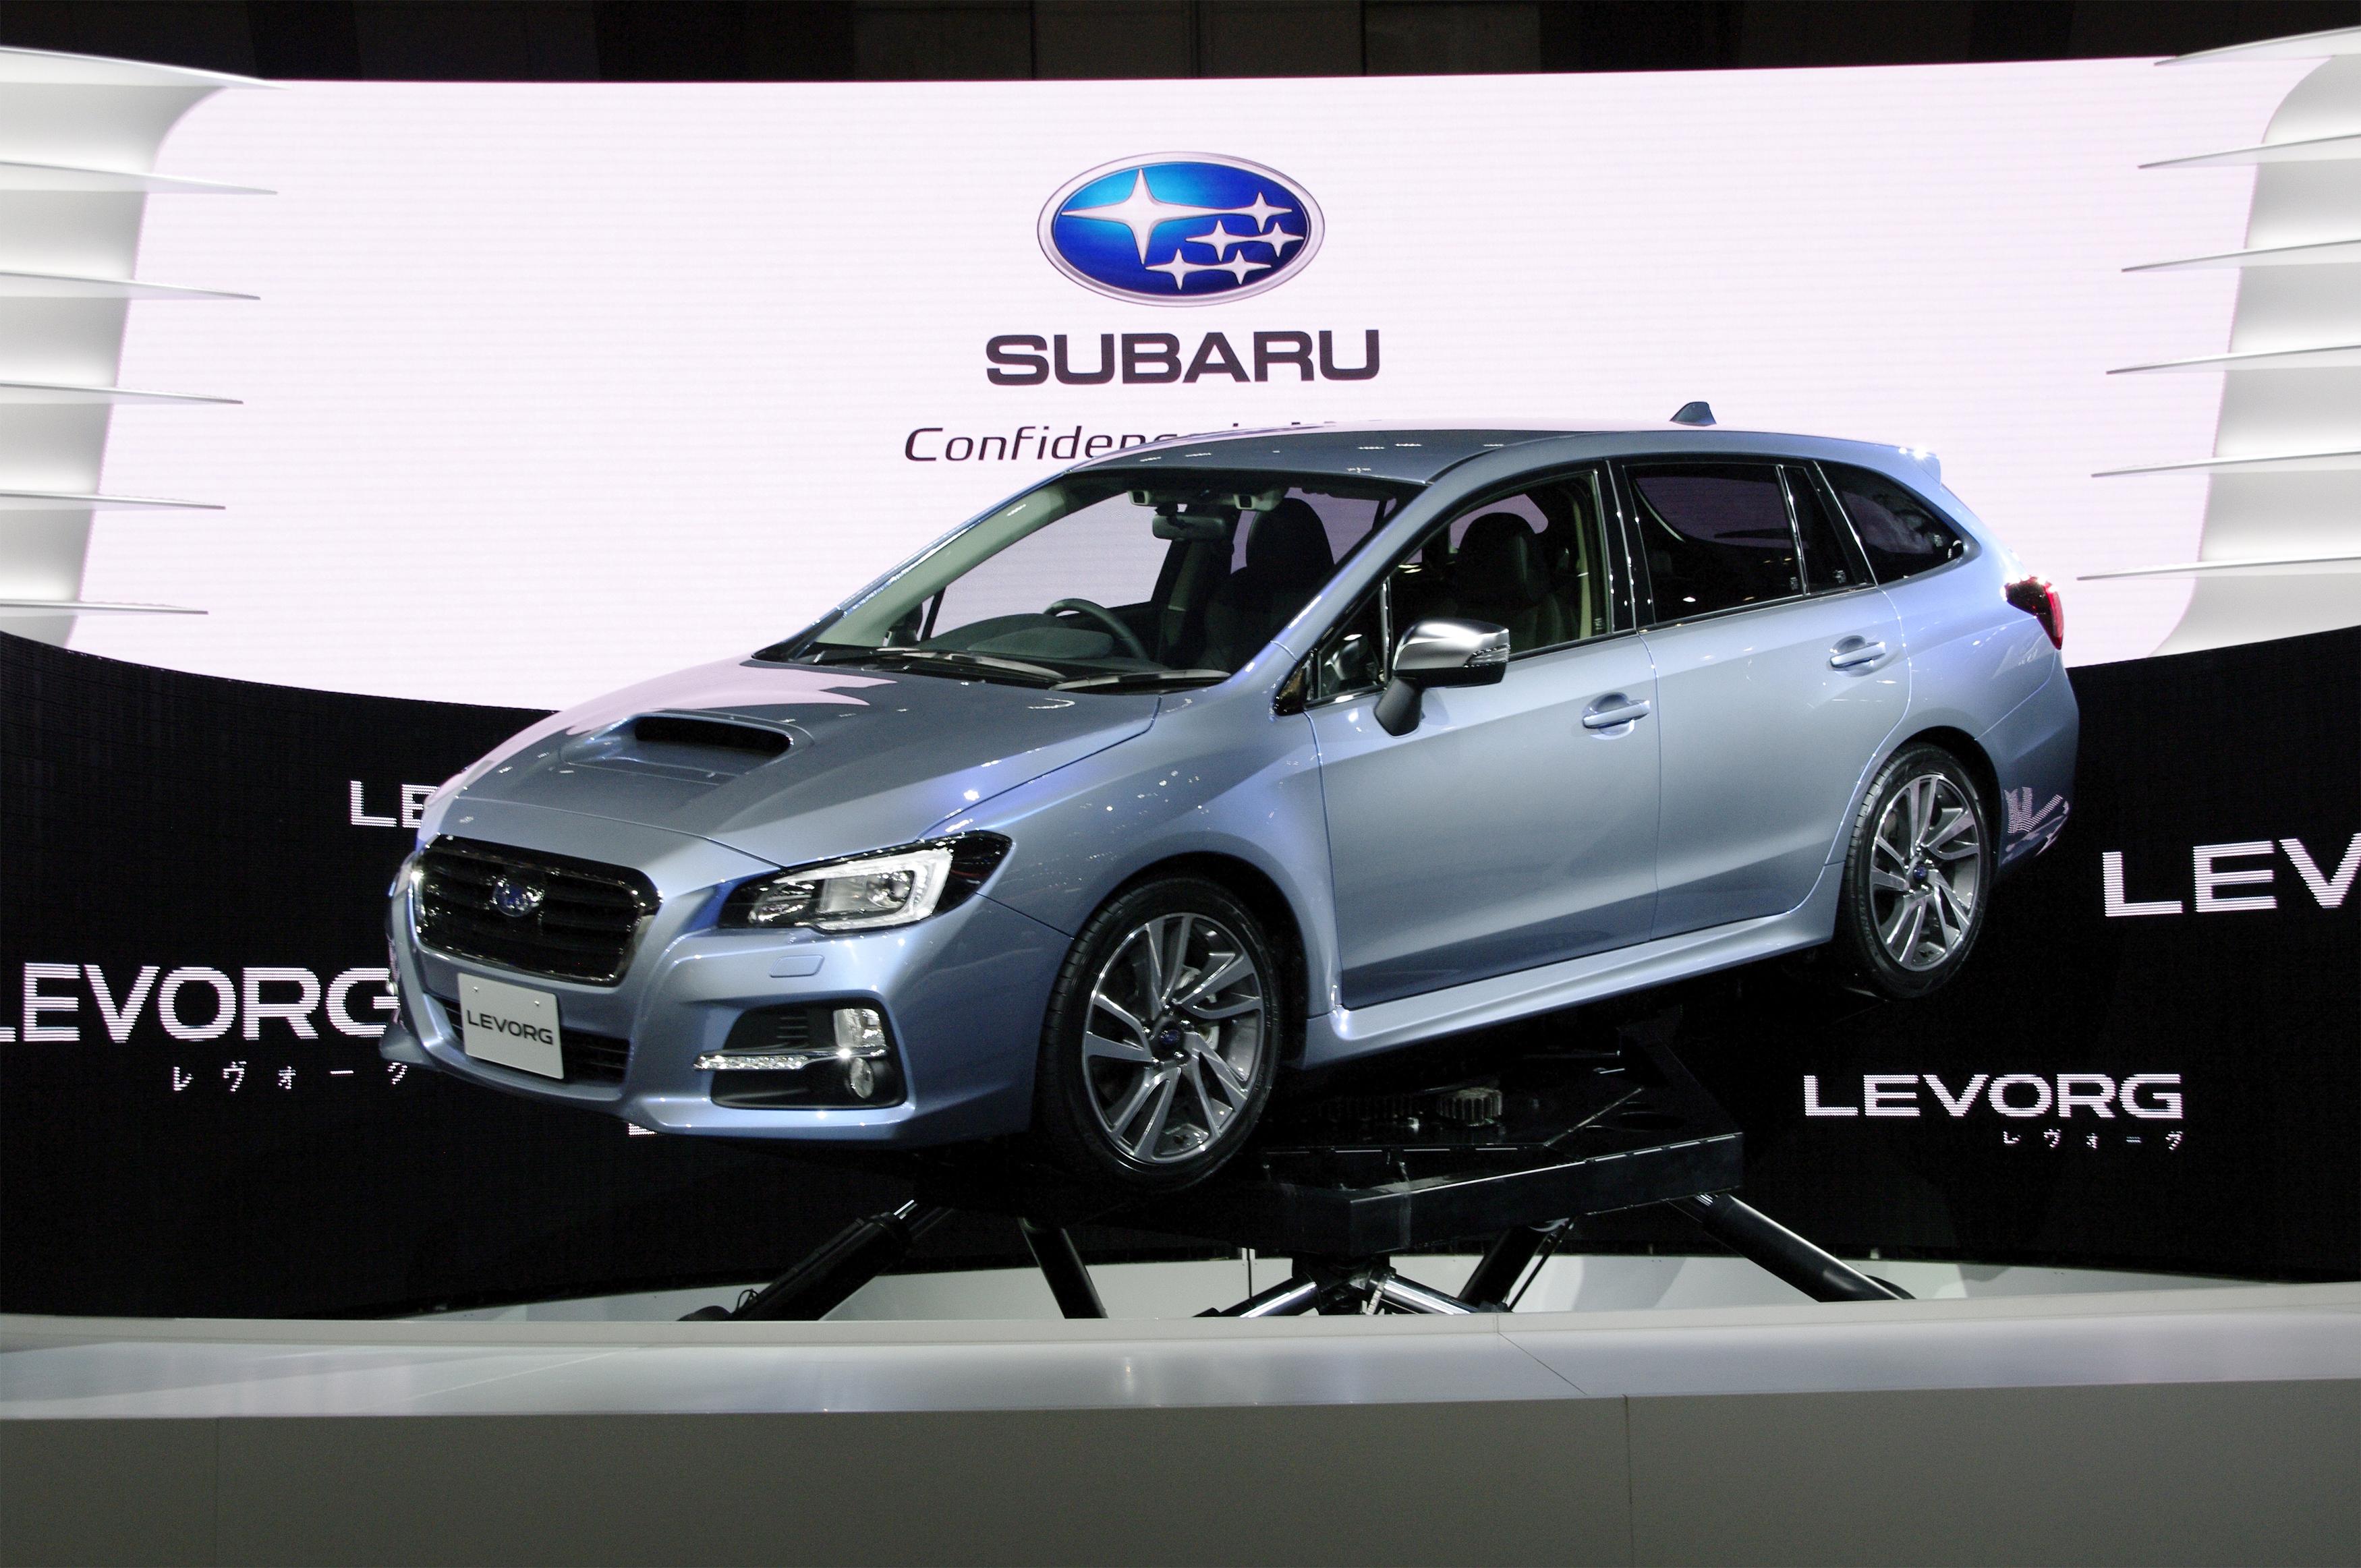 Presentata la Subaru LEVORG